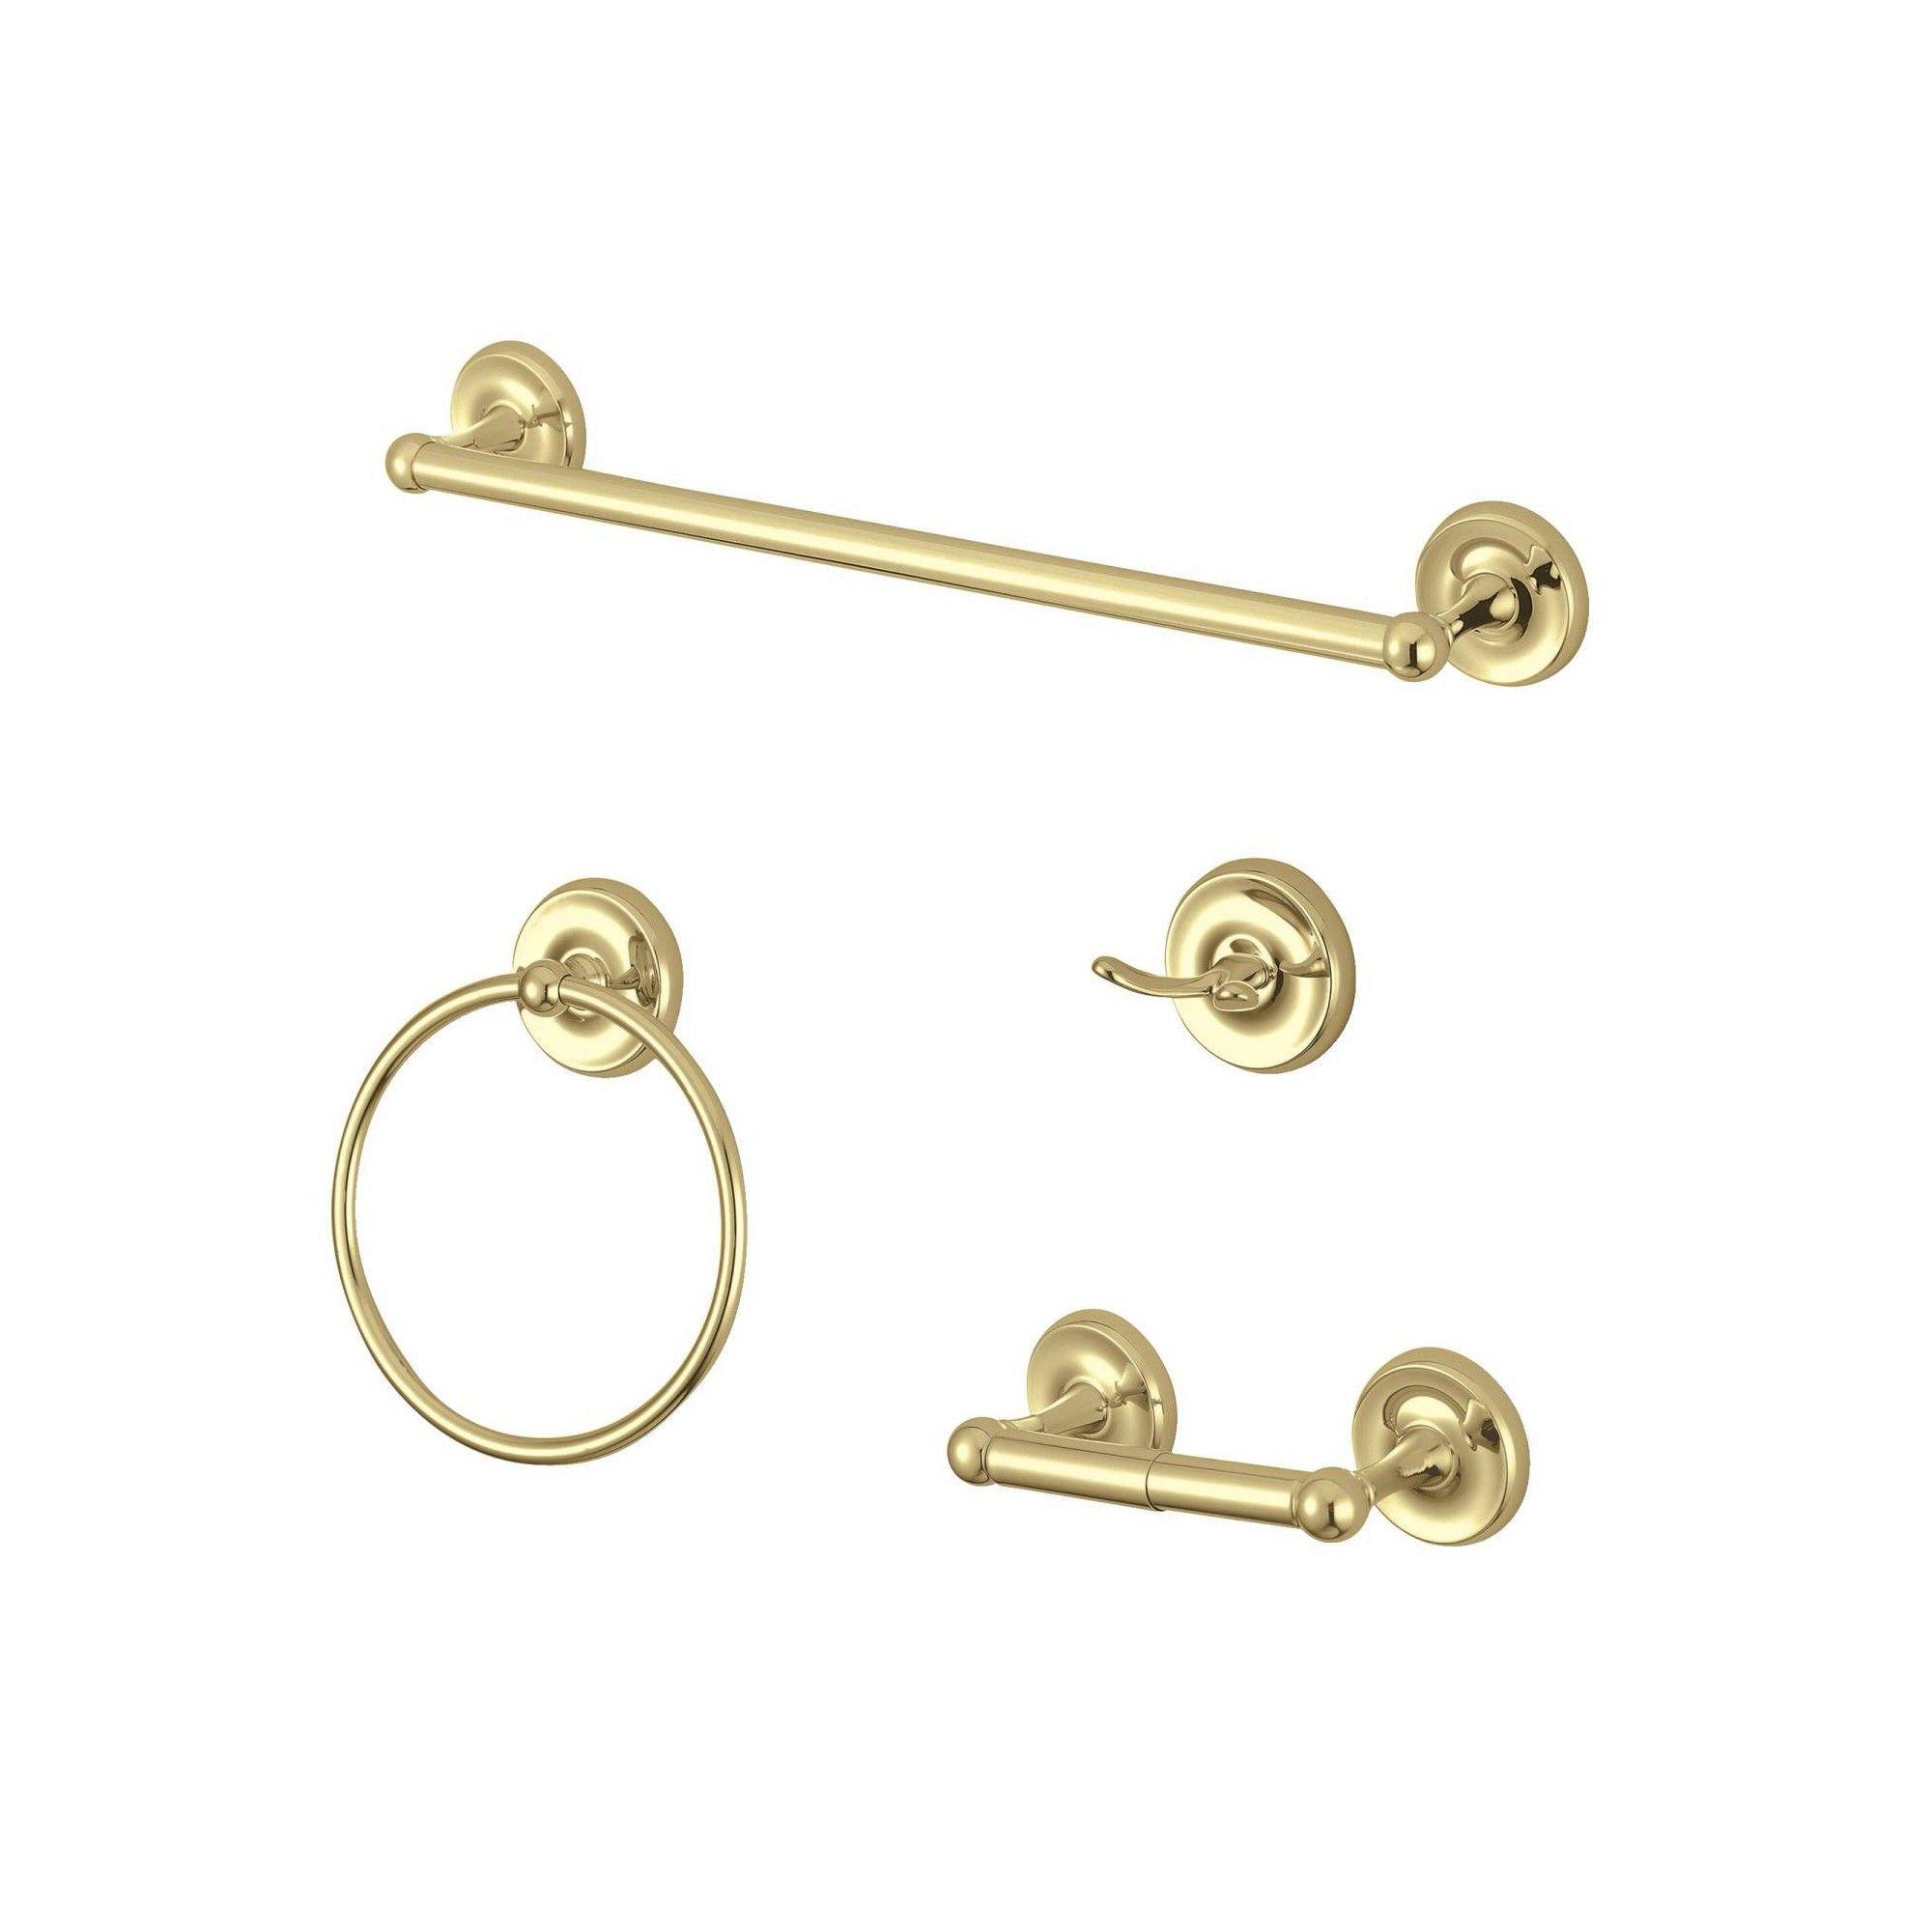 4pc Victorian Bathroom Accessory Set Polished Brass Kingston